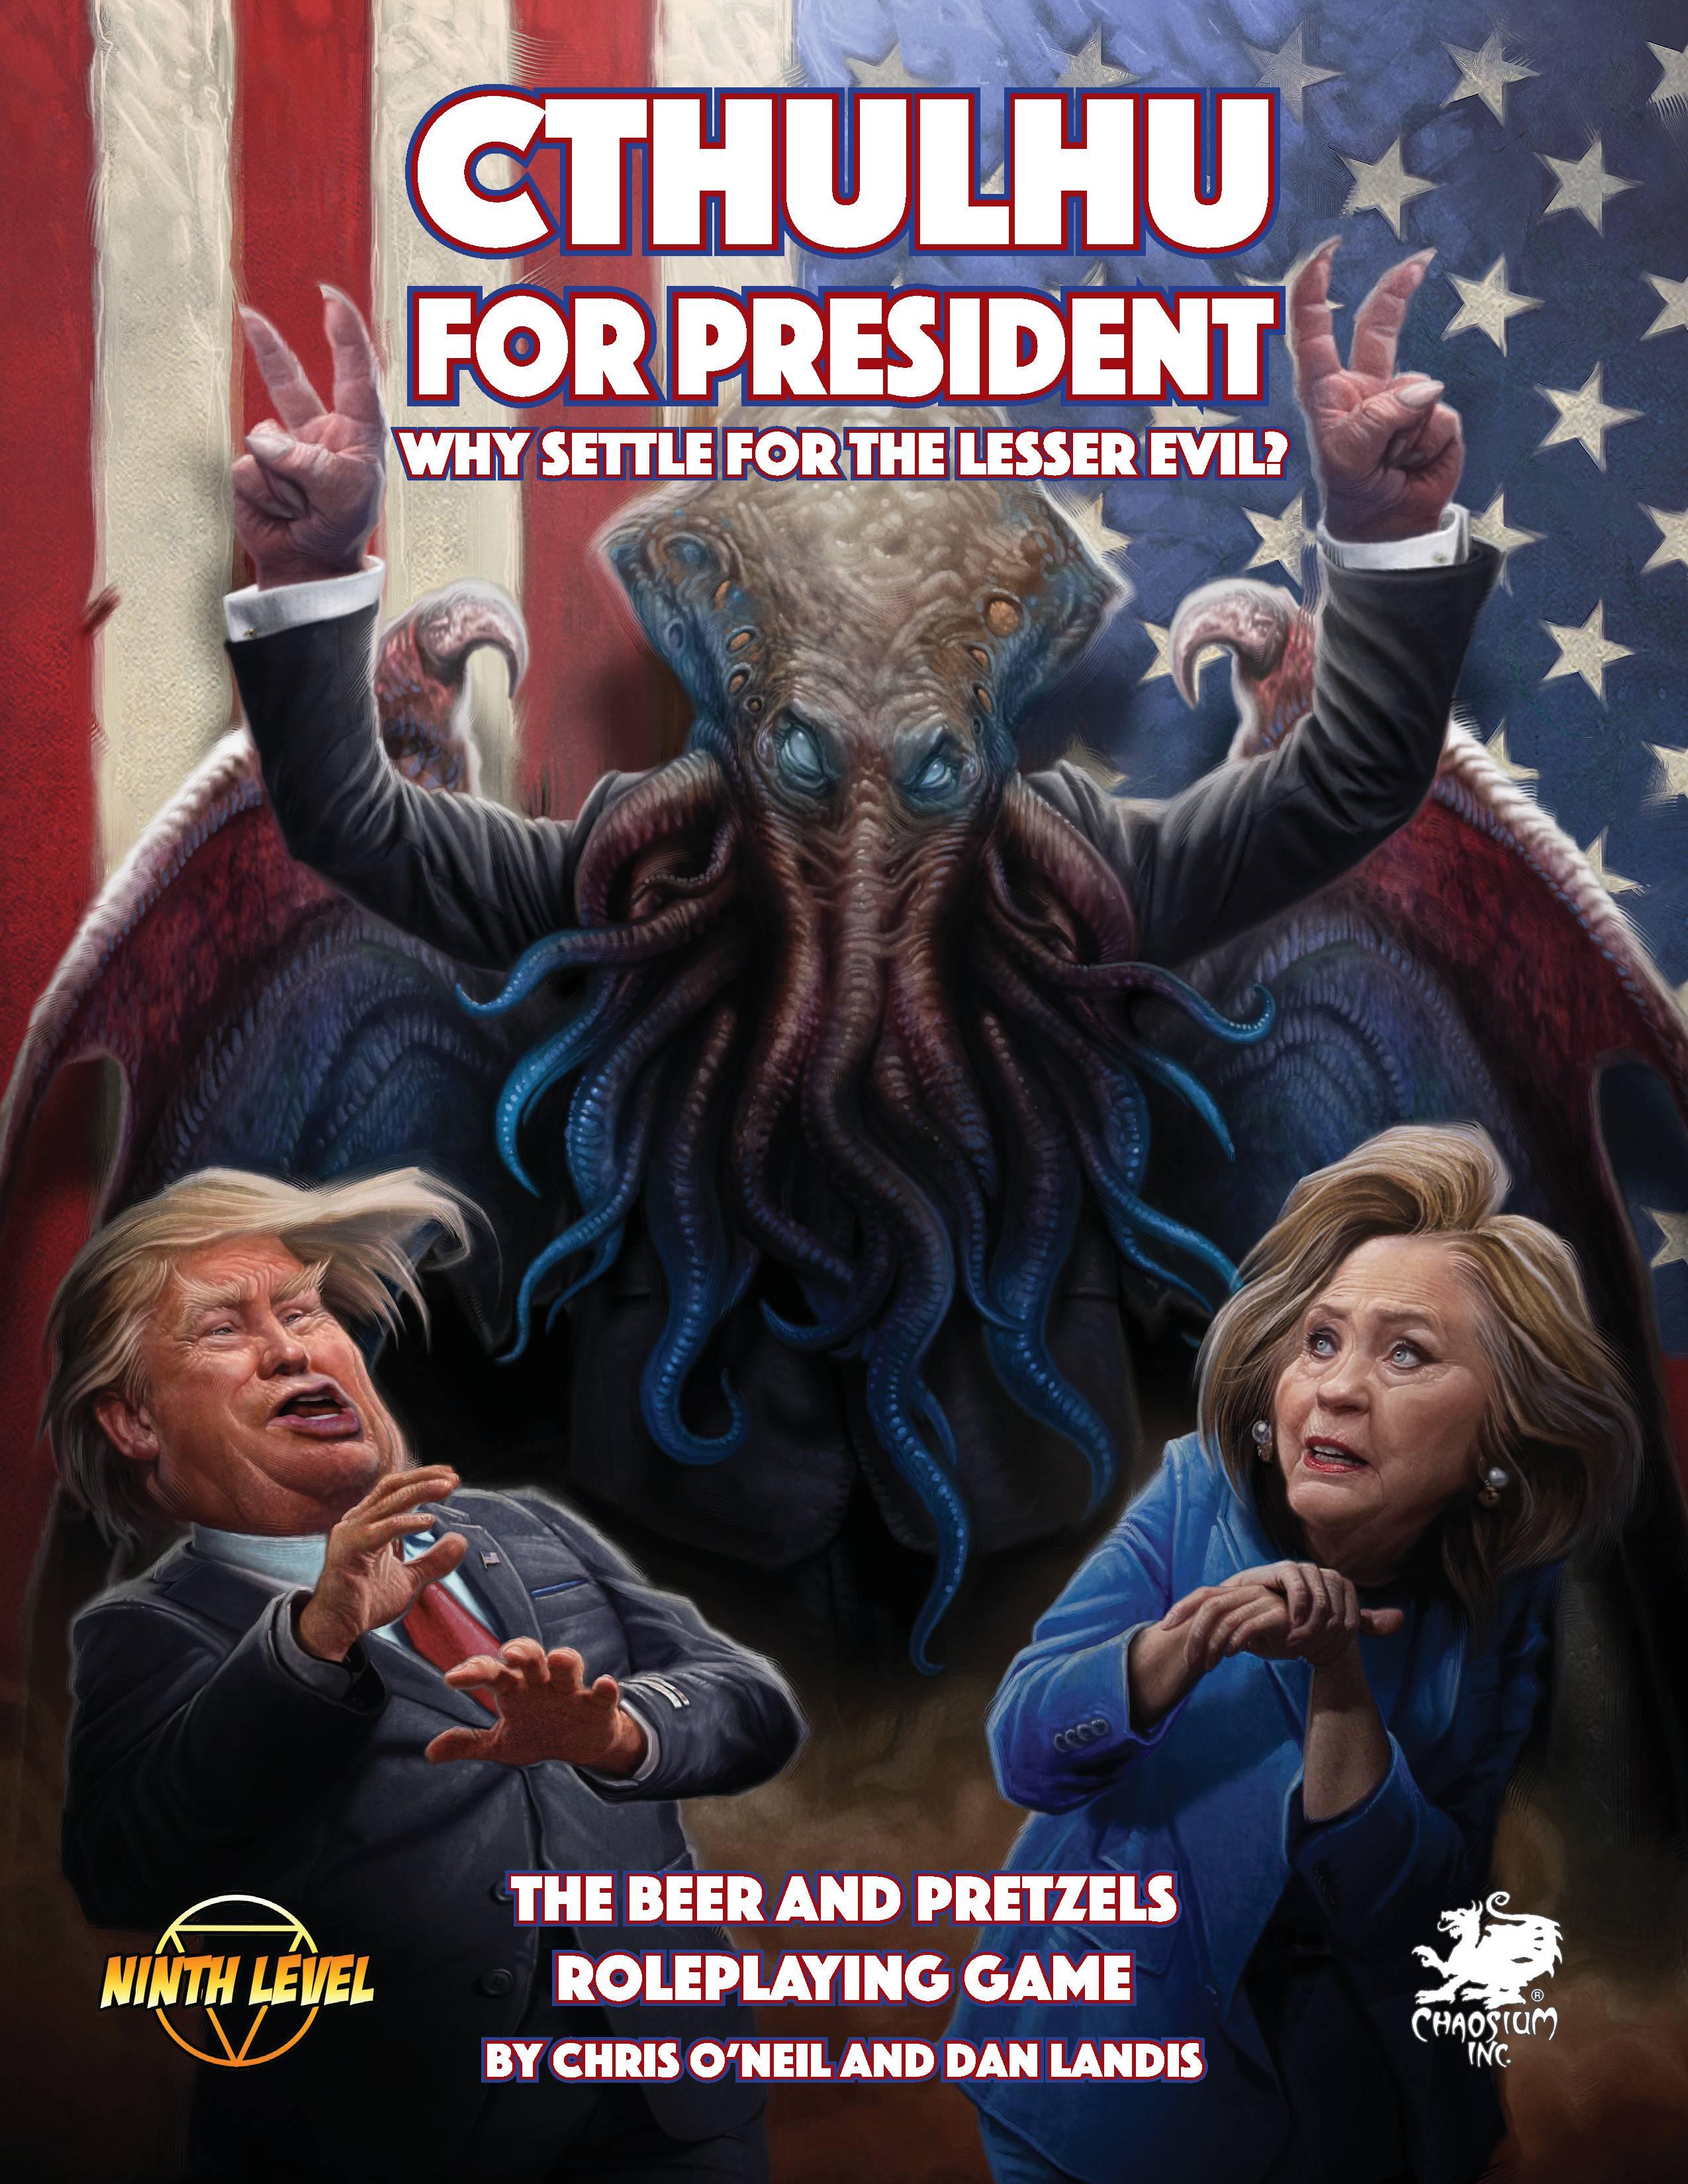 cthulhu-for-president-front-cover.jpg